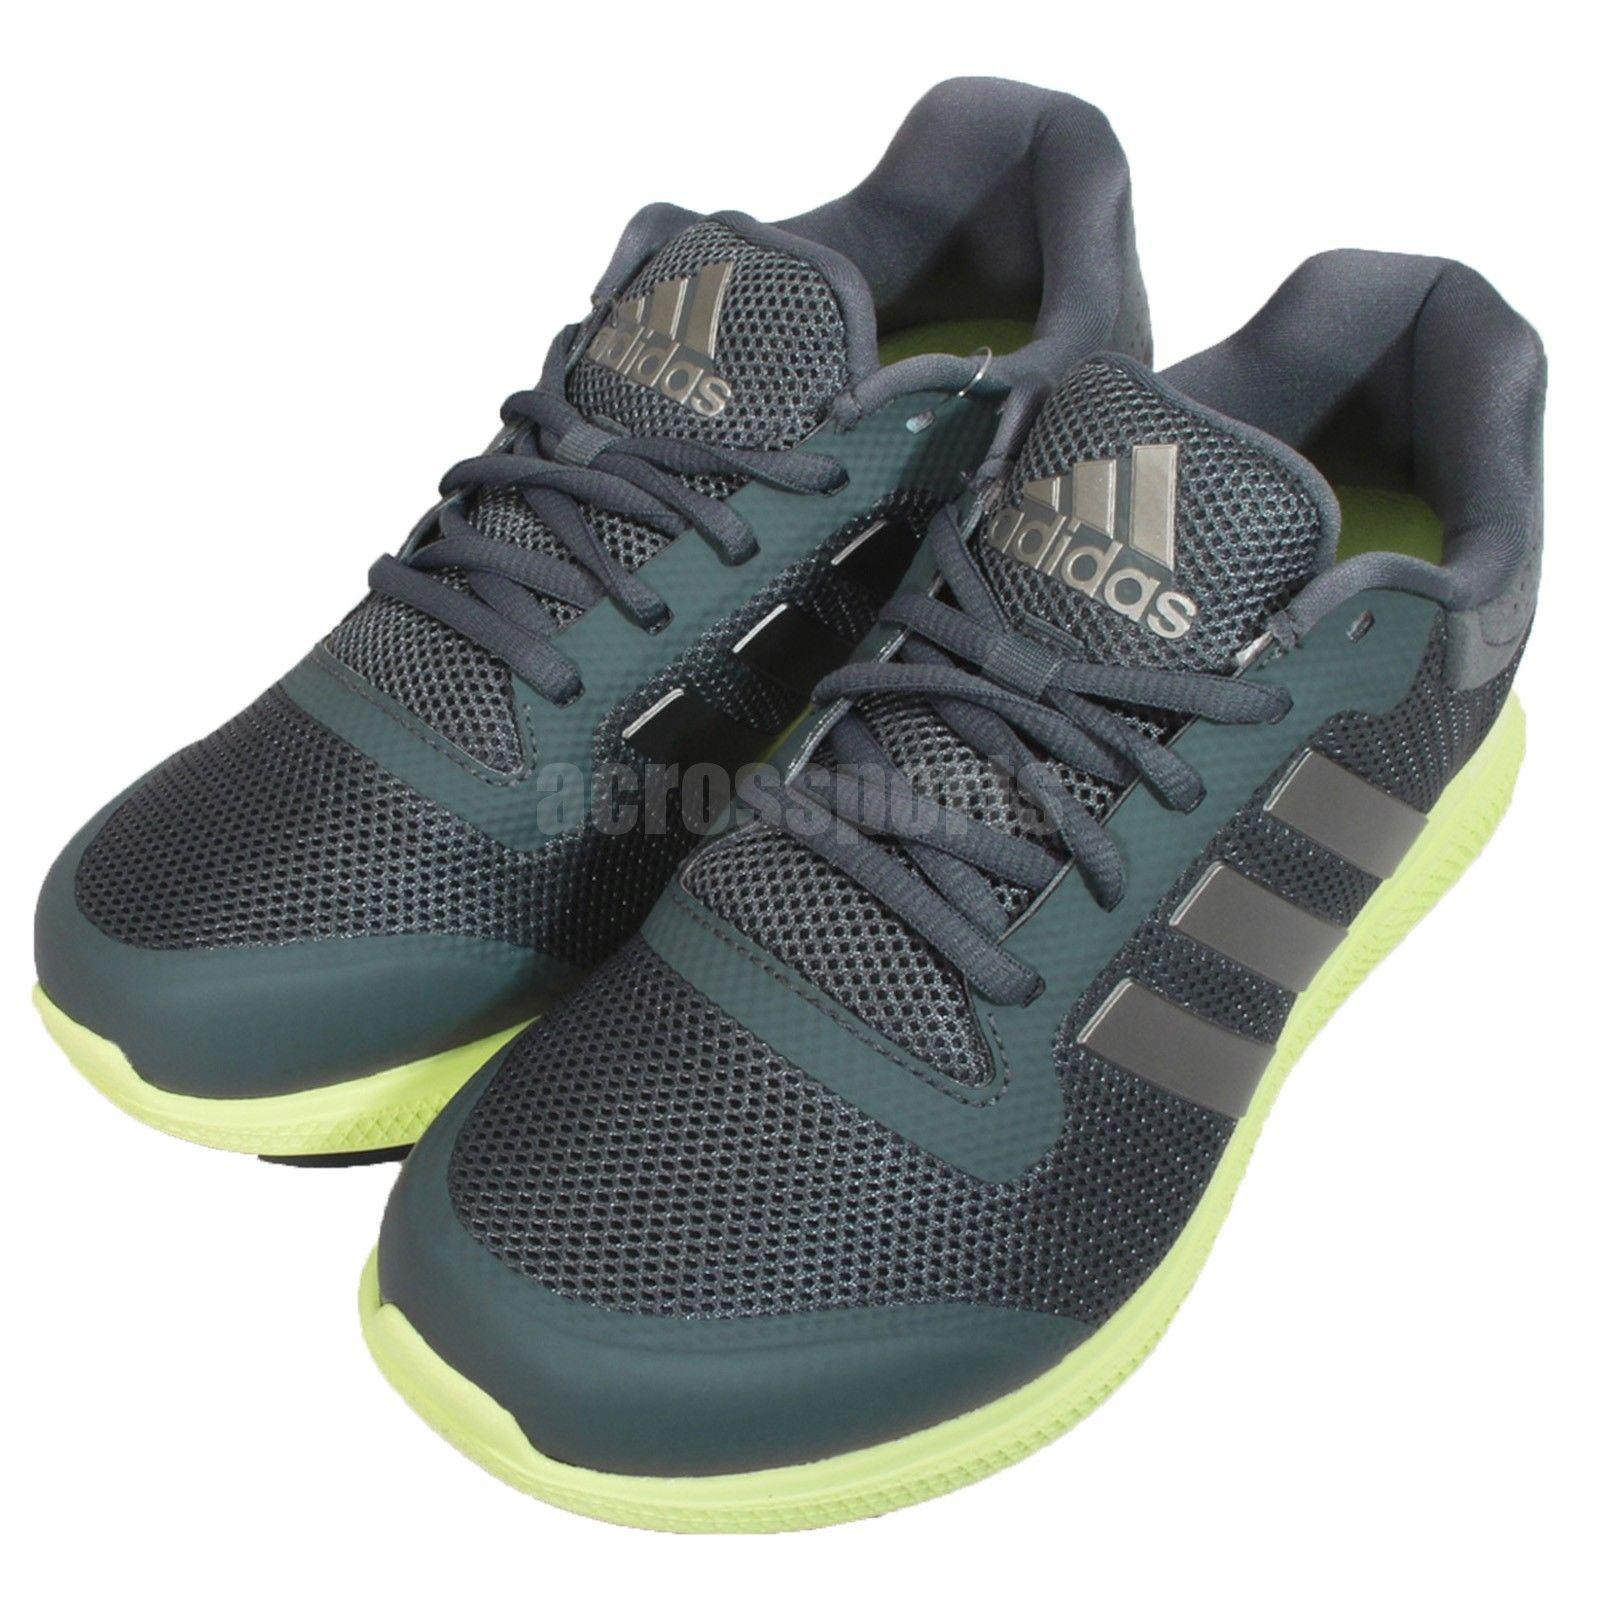 d7b7866e3 Adidas Energy Bounce W Grey Green Womens Jogging Running Shoes Sneakers  B33963